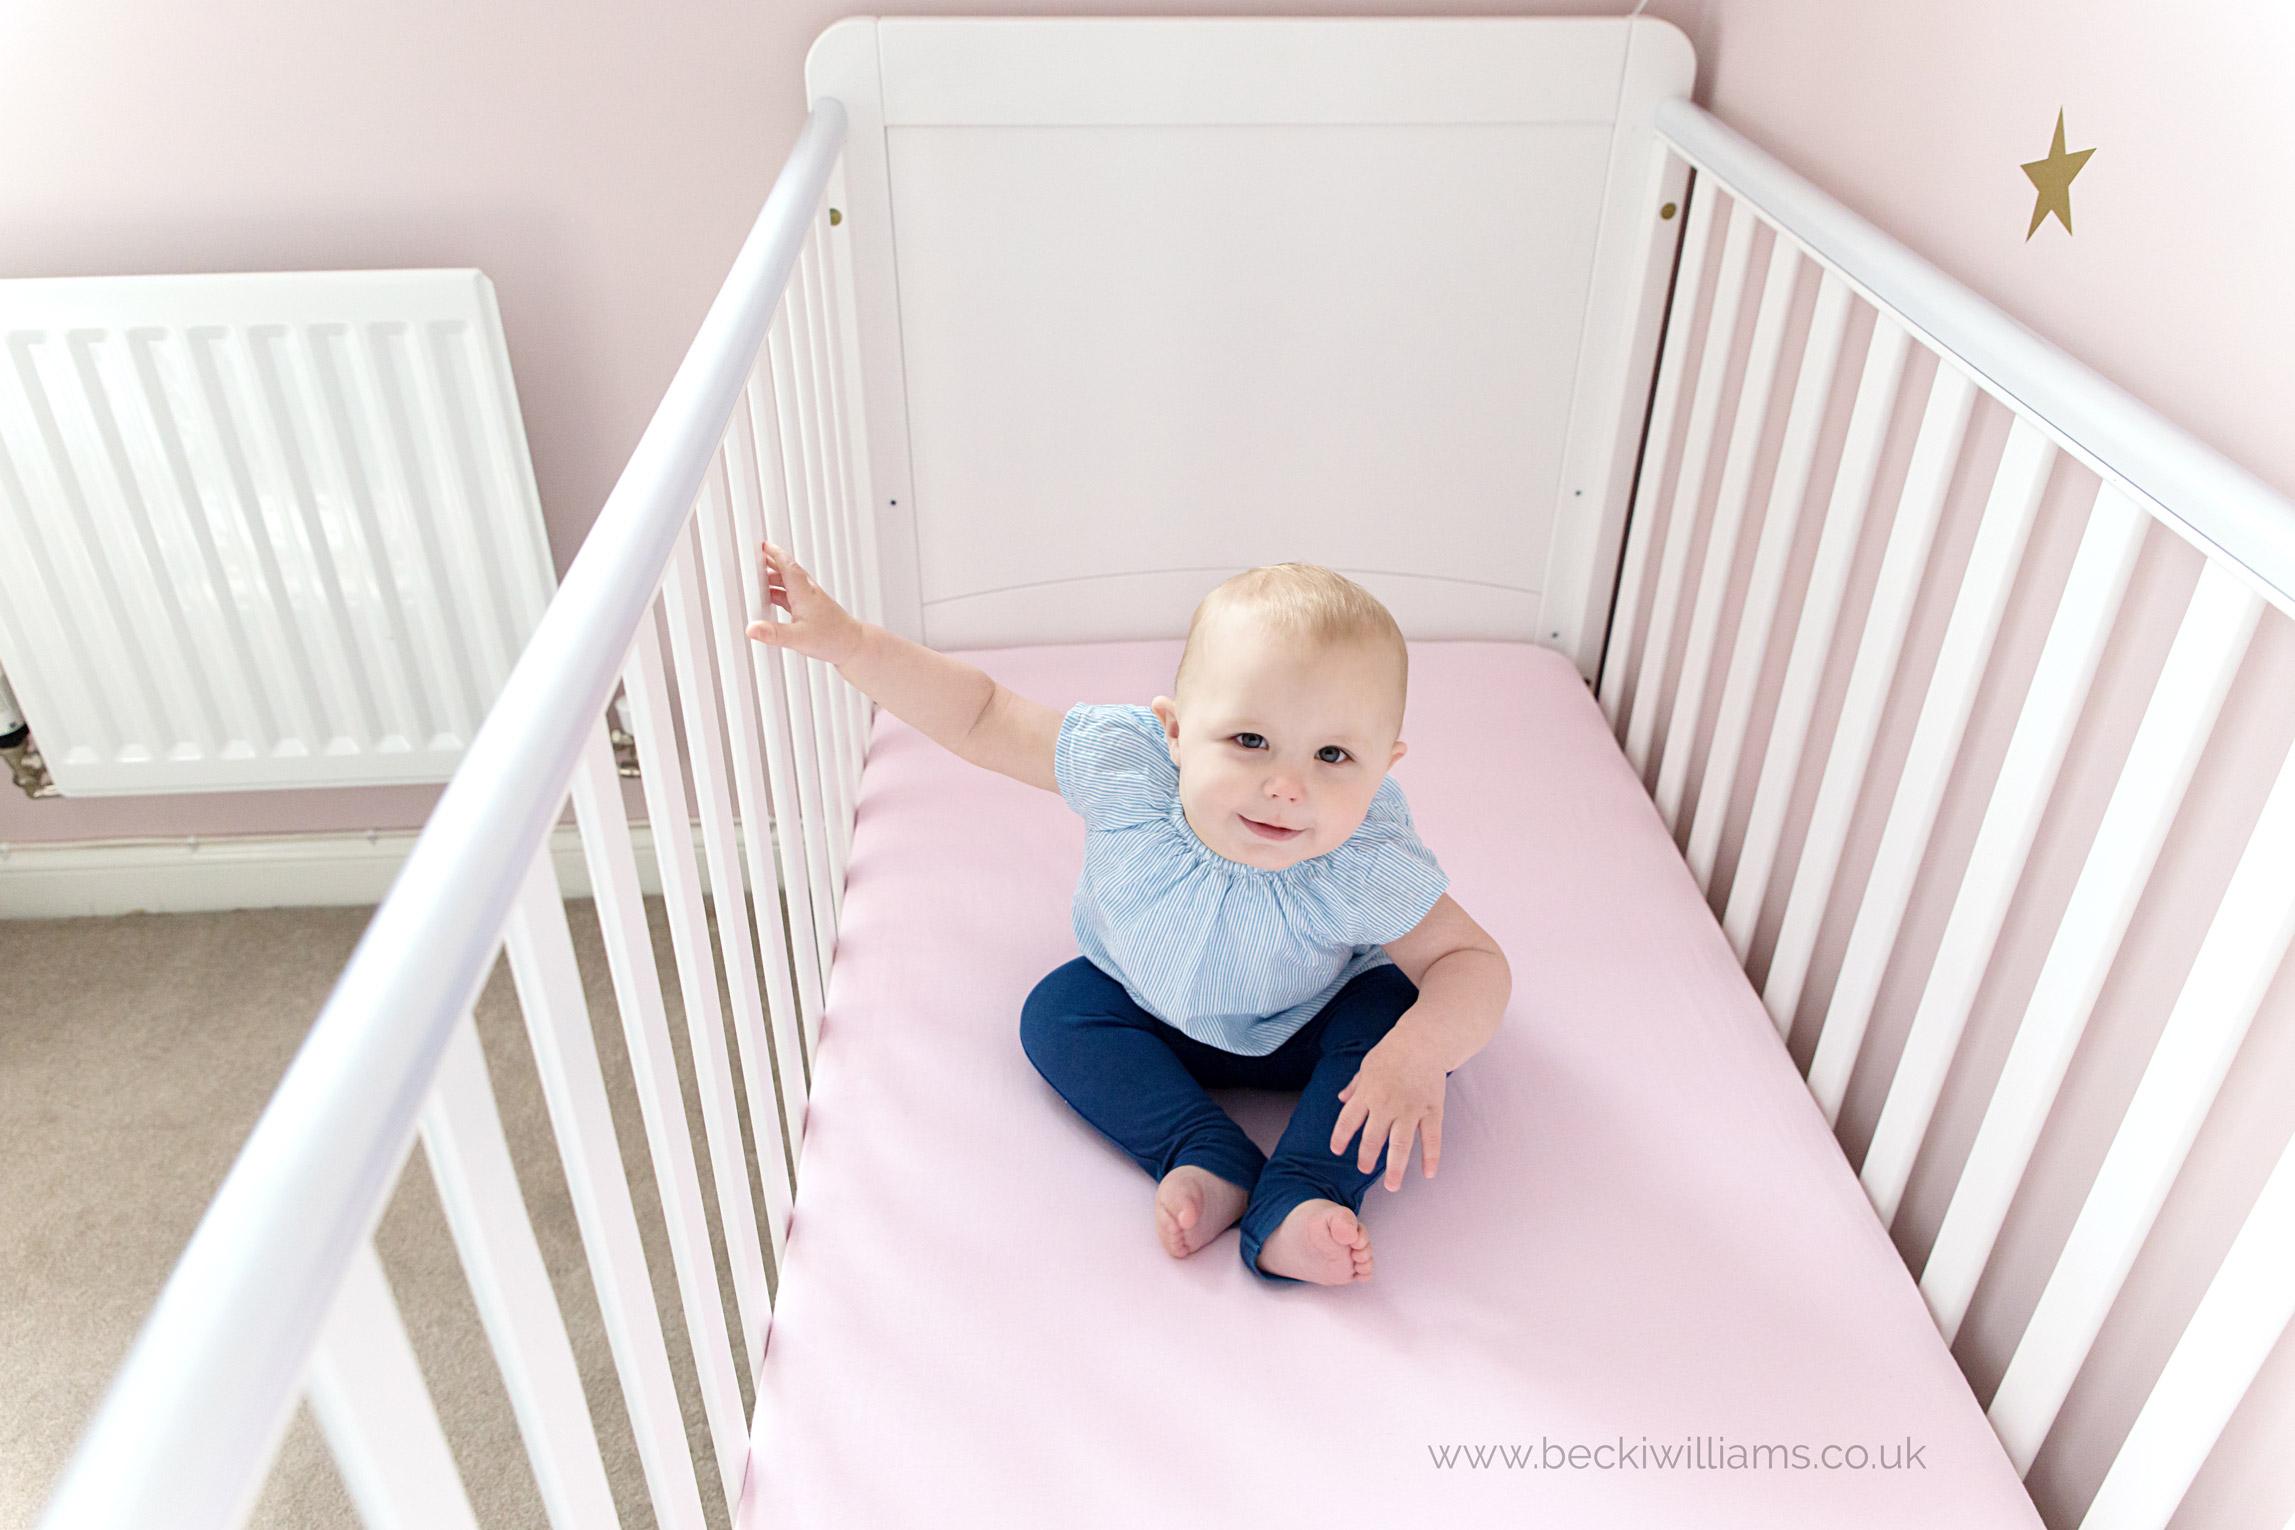 baby-photographer-hemel-hempstead-1-year-old-at-home-cot